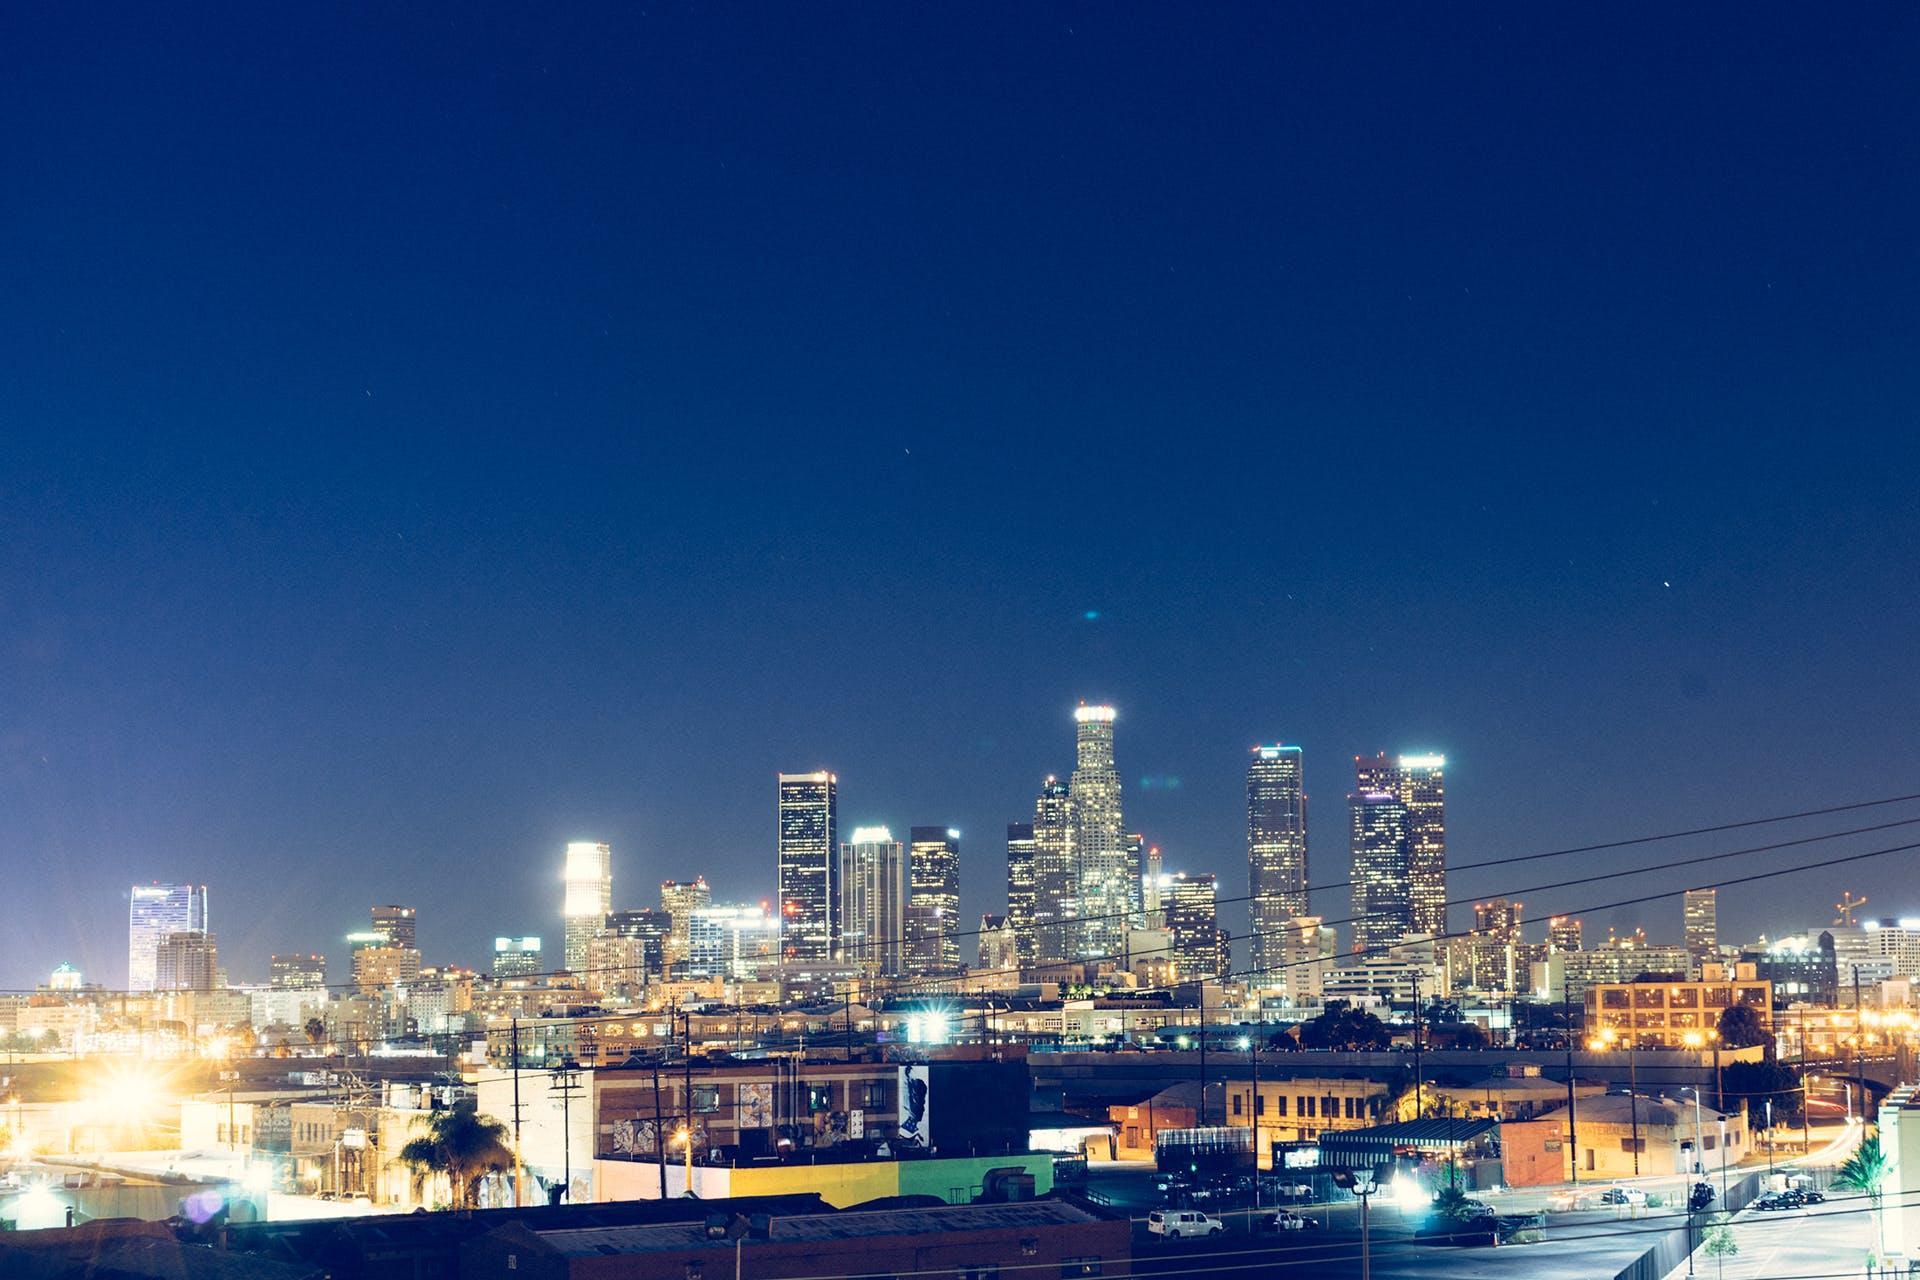 city, HD wallpaper, night